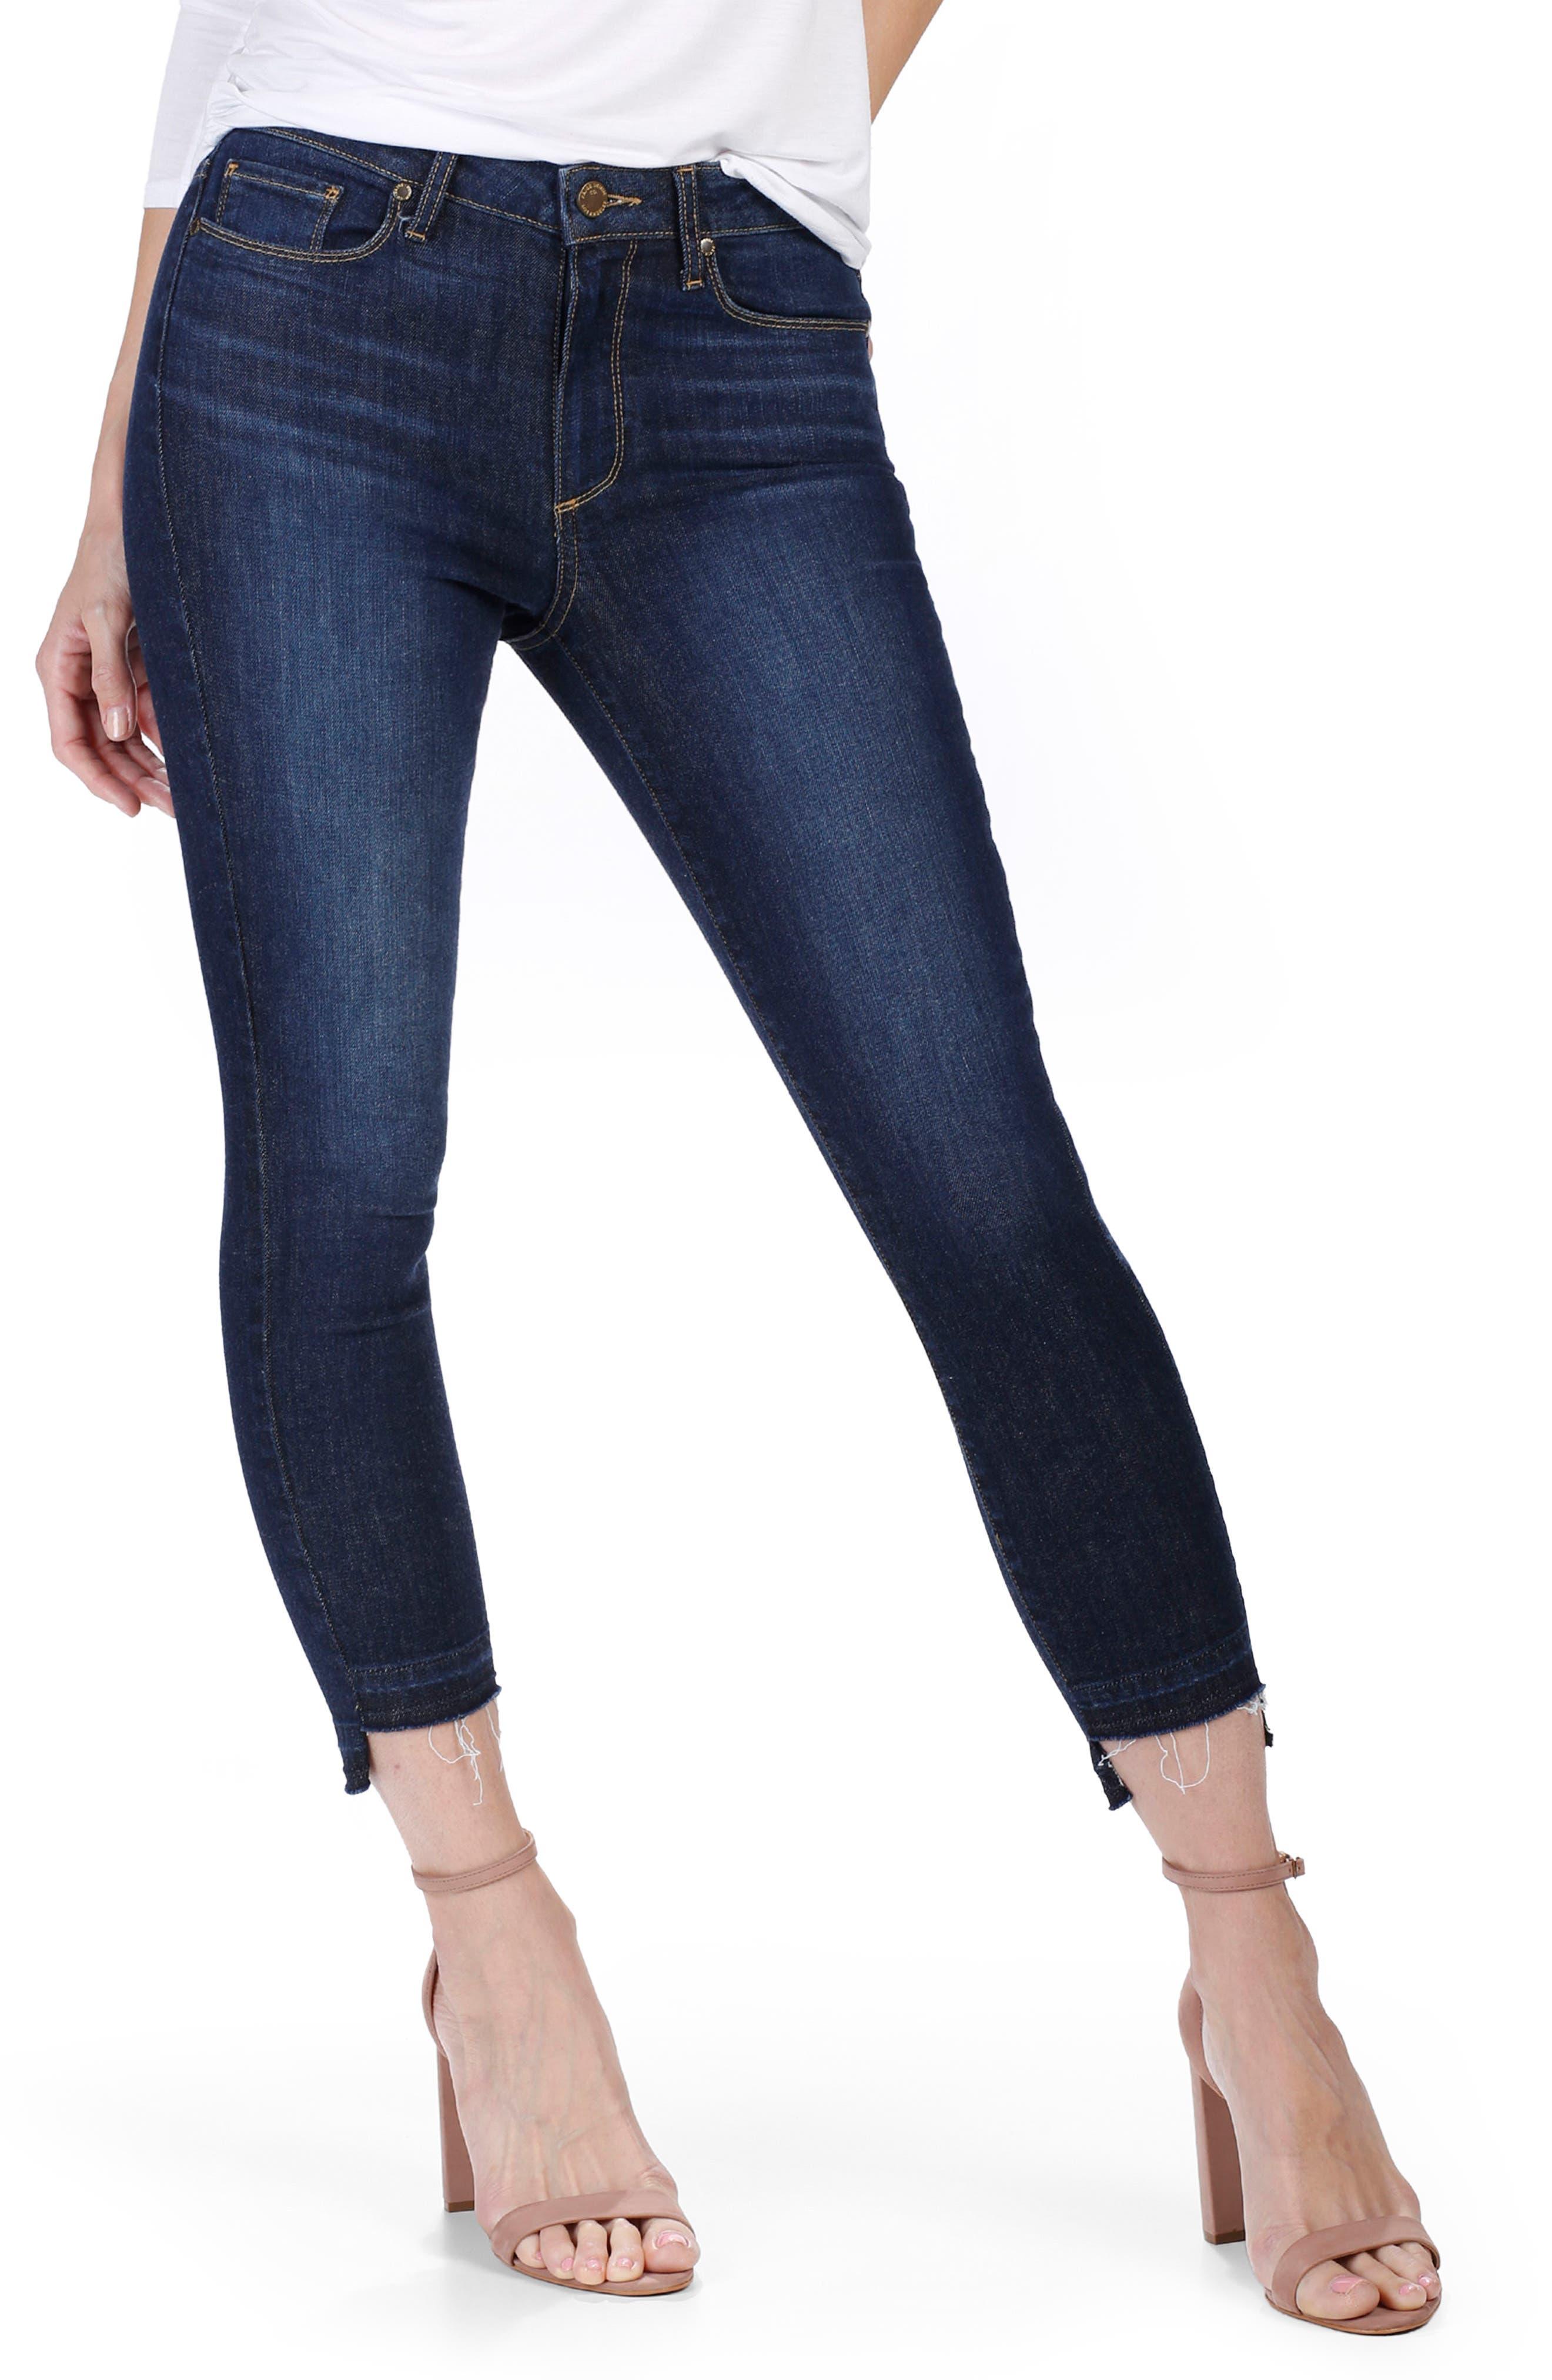 Hoxton High Waist Crop Ultra Skinny Jeans,                             Main thumbnail 1, color,                             400